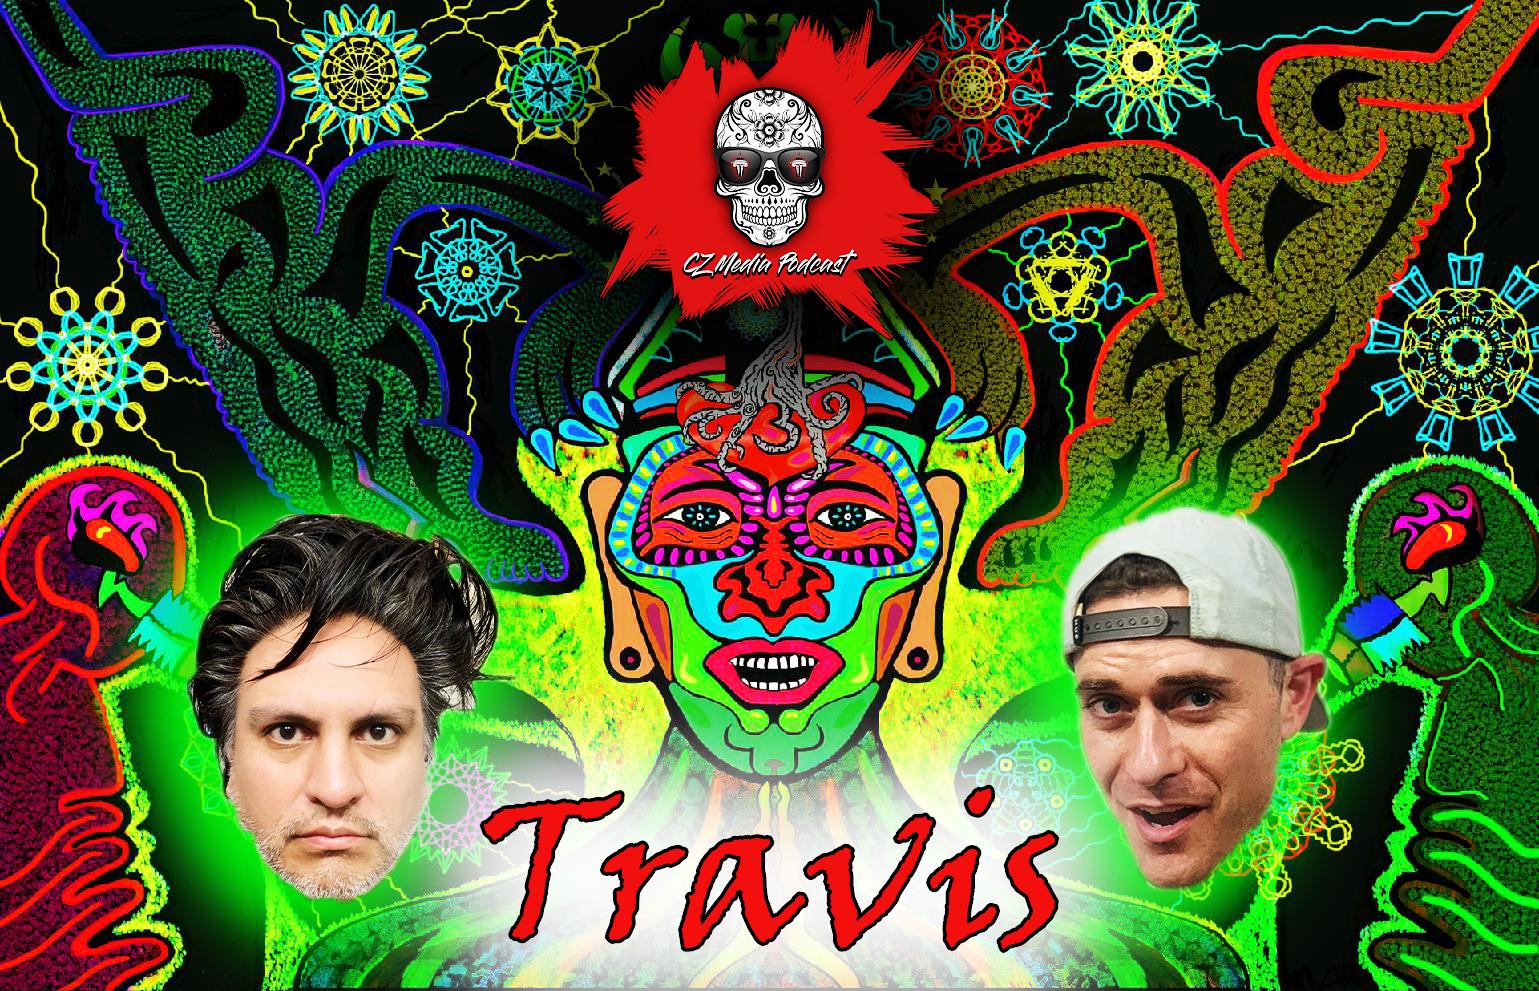 33_Travis.png